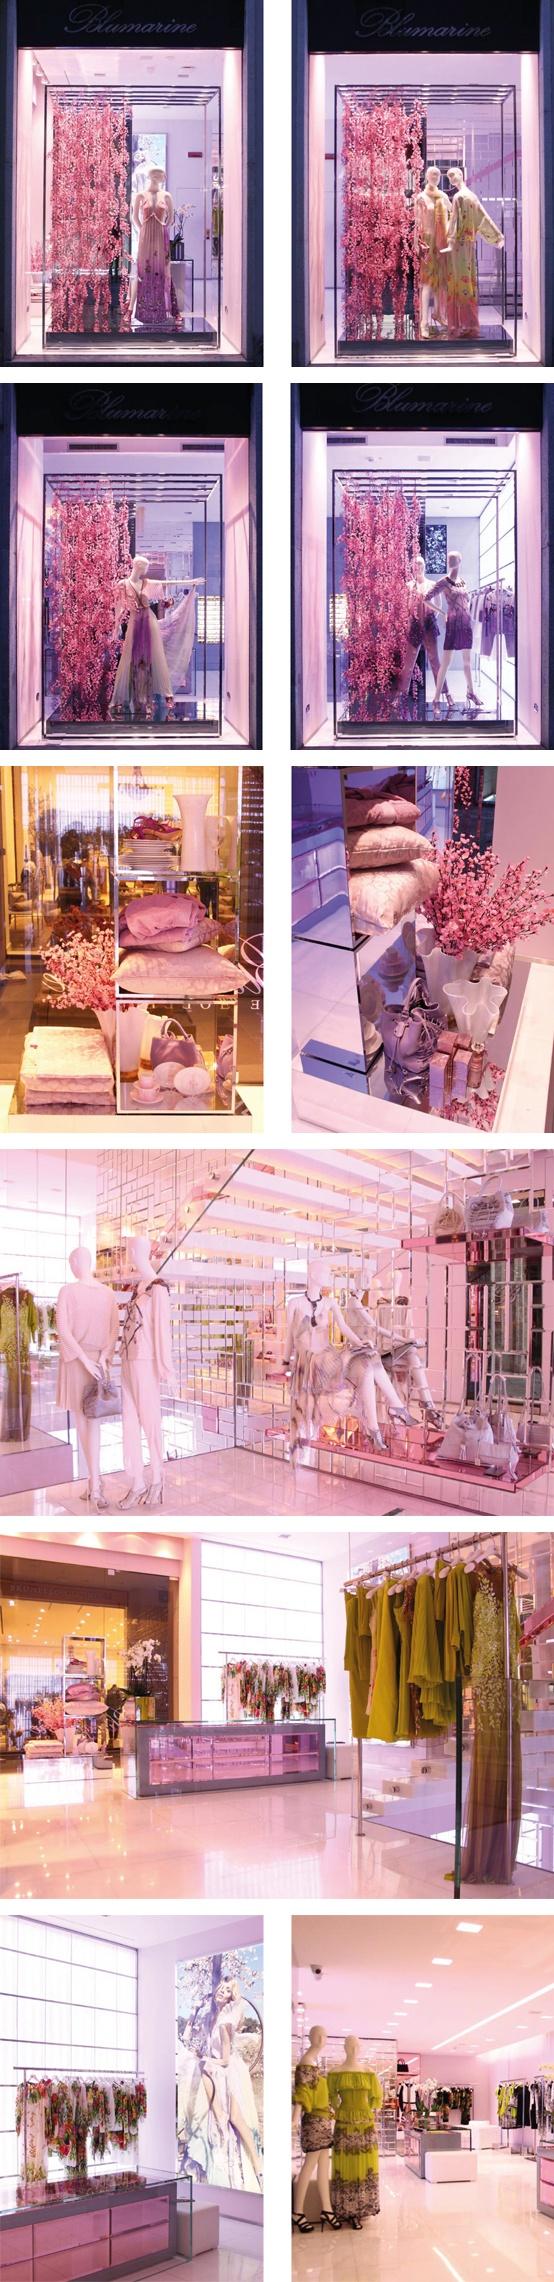 Blumarine Milan Boutique Windows - February 2013